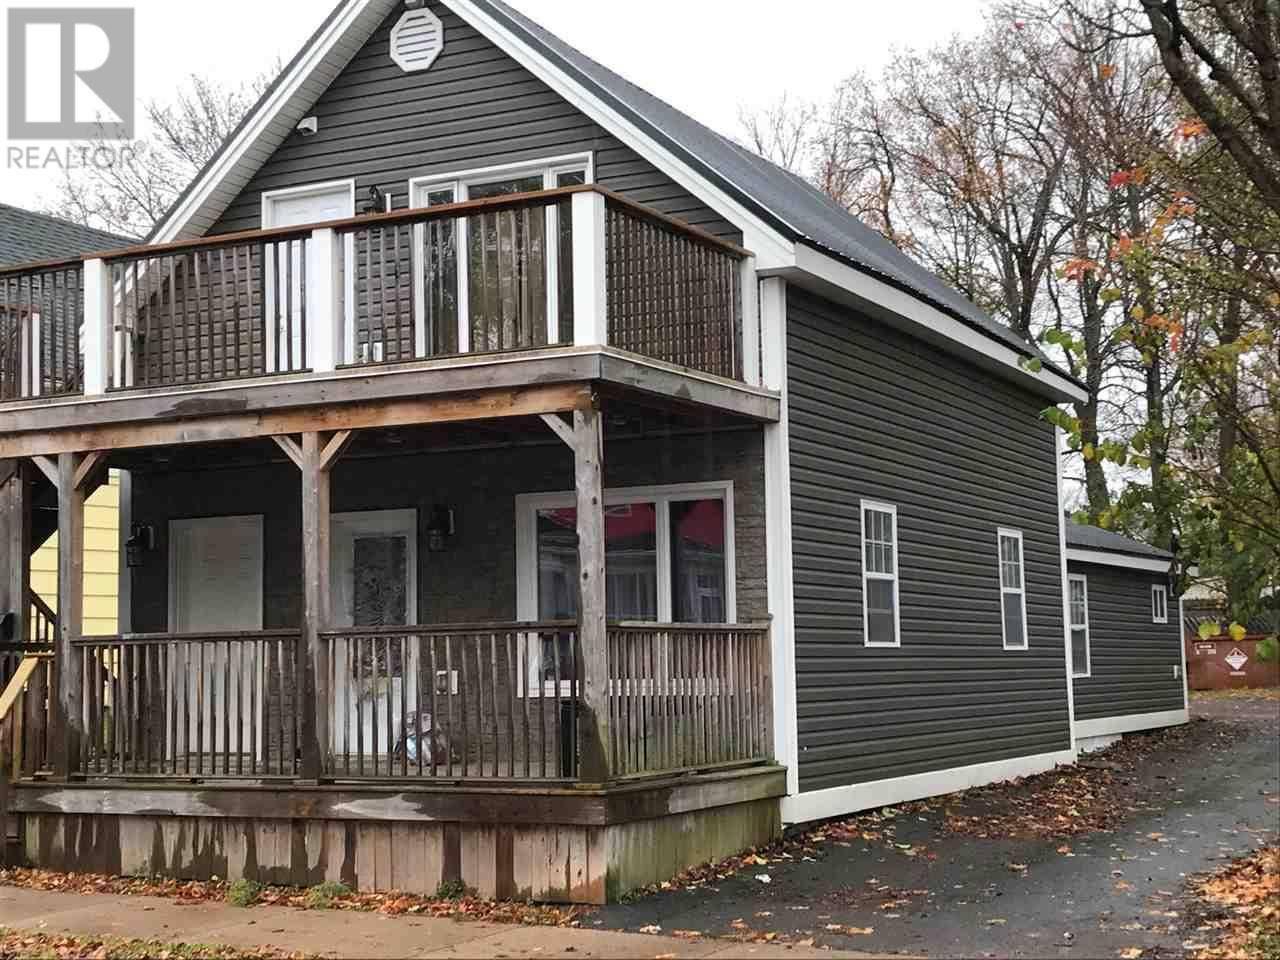 Townhouse for sale at 90 Dominion St Truro Nova Scotia - MLS: 201927240